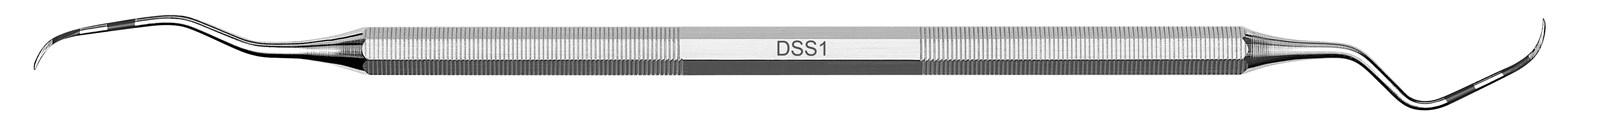 Kyreta Deppeler smart scaling (DSS) - DSS1, ADEP světle zelený